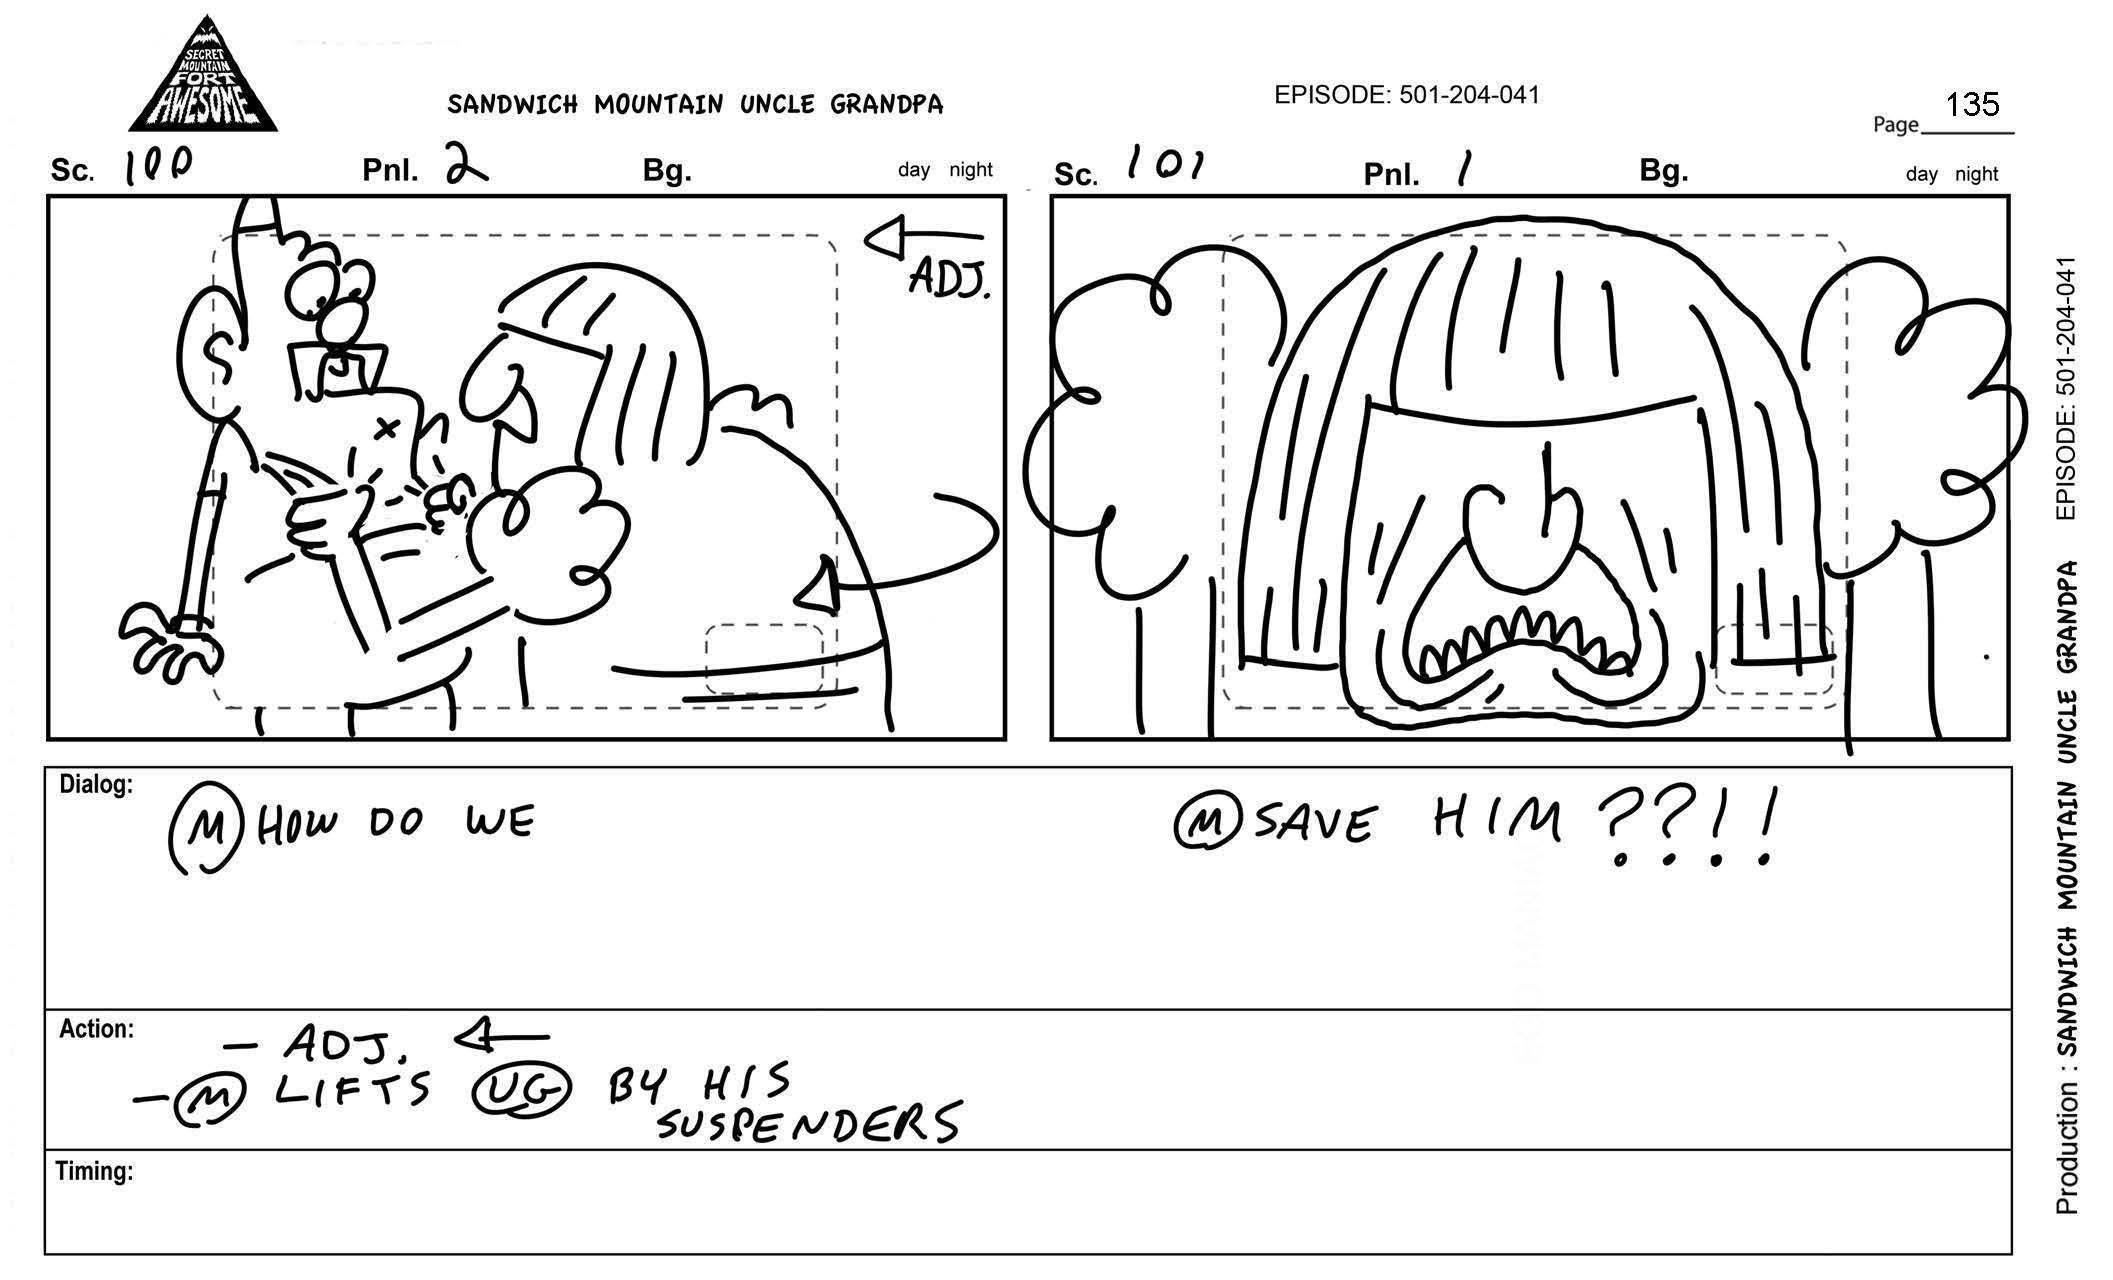 SMFA_SandwichMountainUncleGrandpa_Page_135.jpg